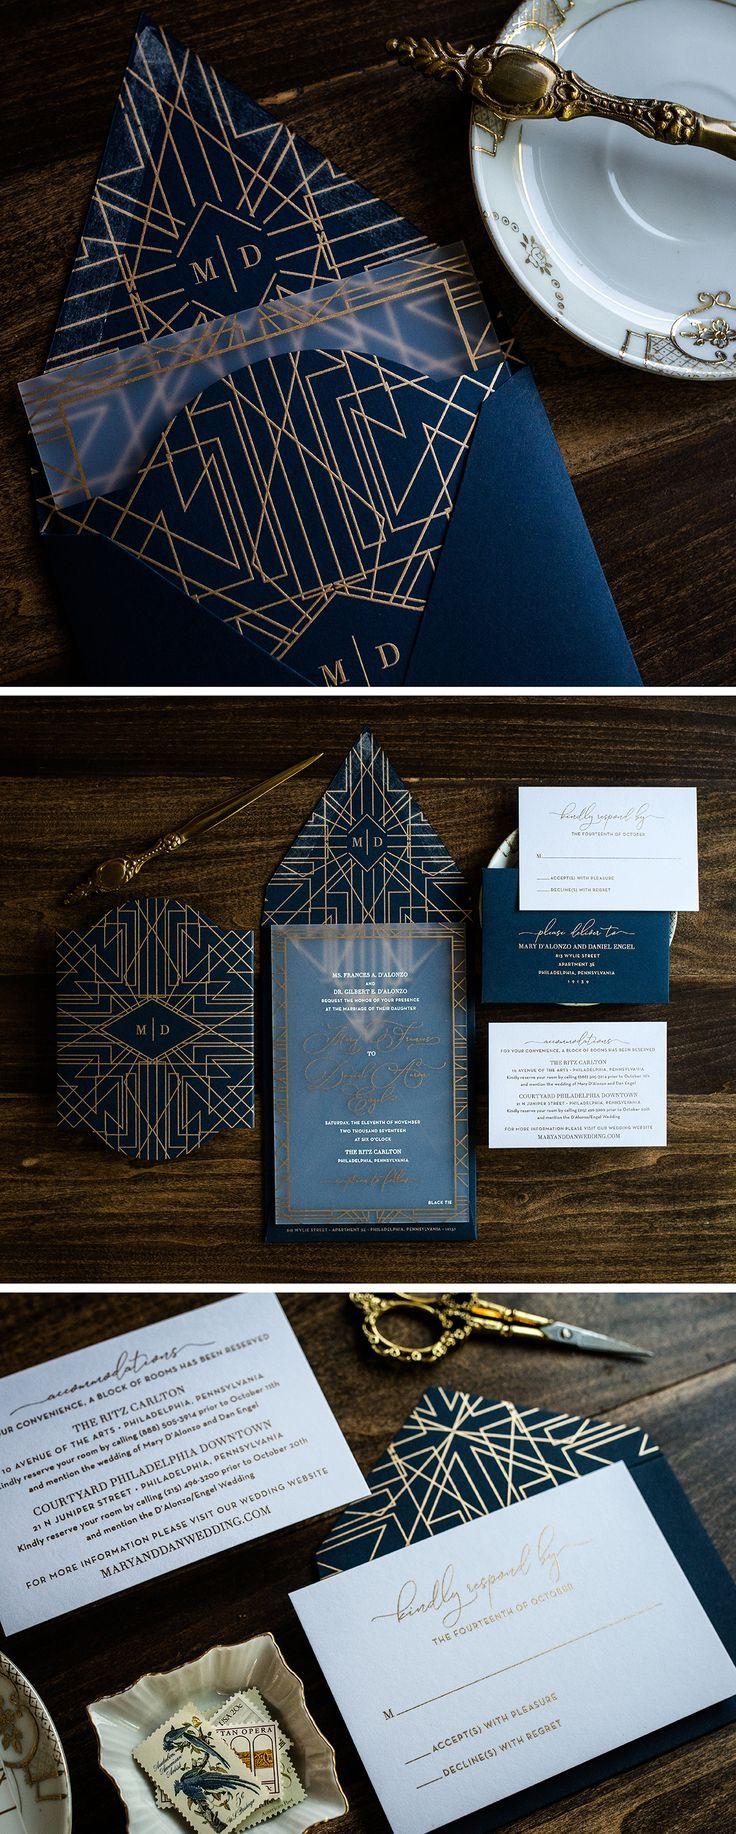 63 best luxury wedding invitations images on pinterest custom unique navy and gold art deco acrylic wedding invitation by penn paperie monicamarmolfo Choice Image